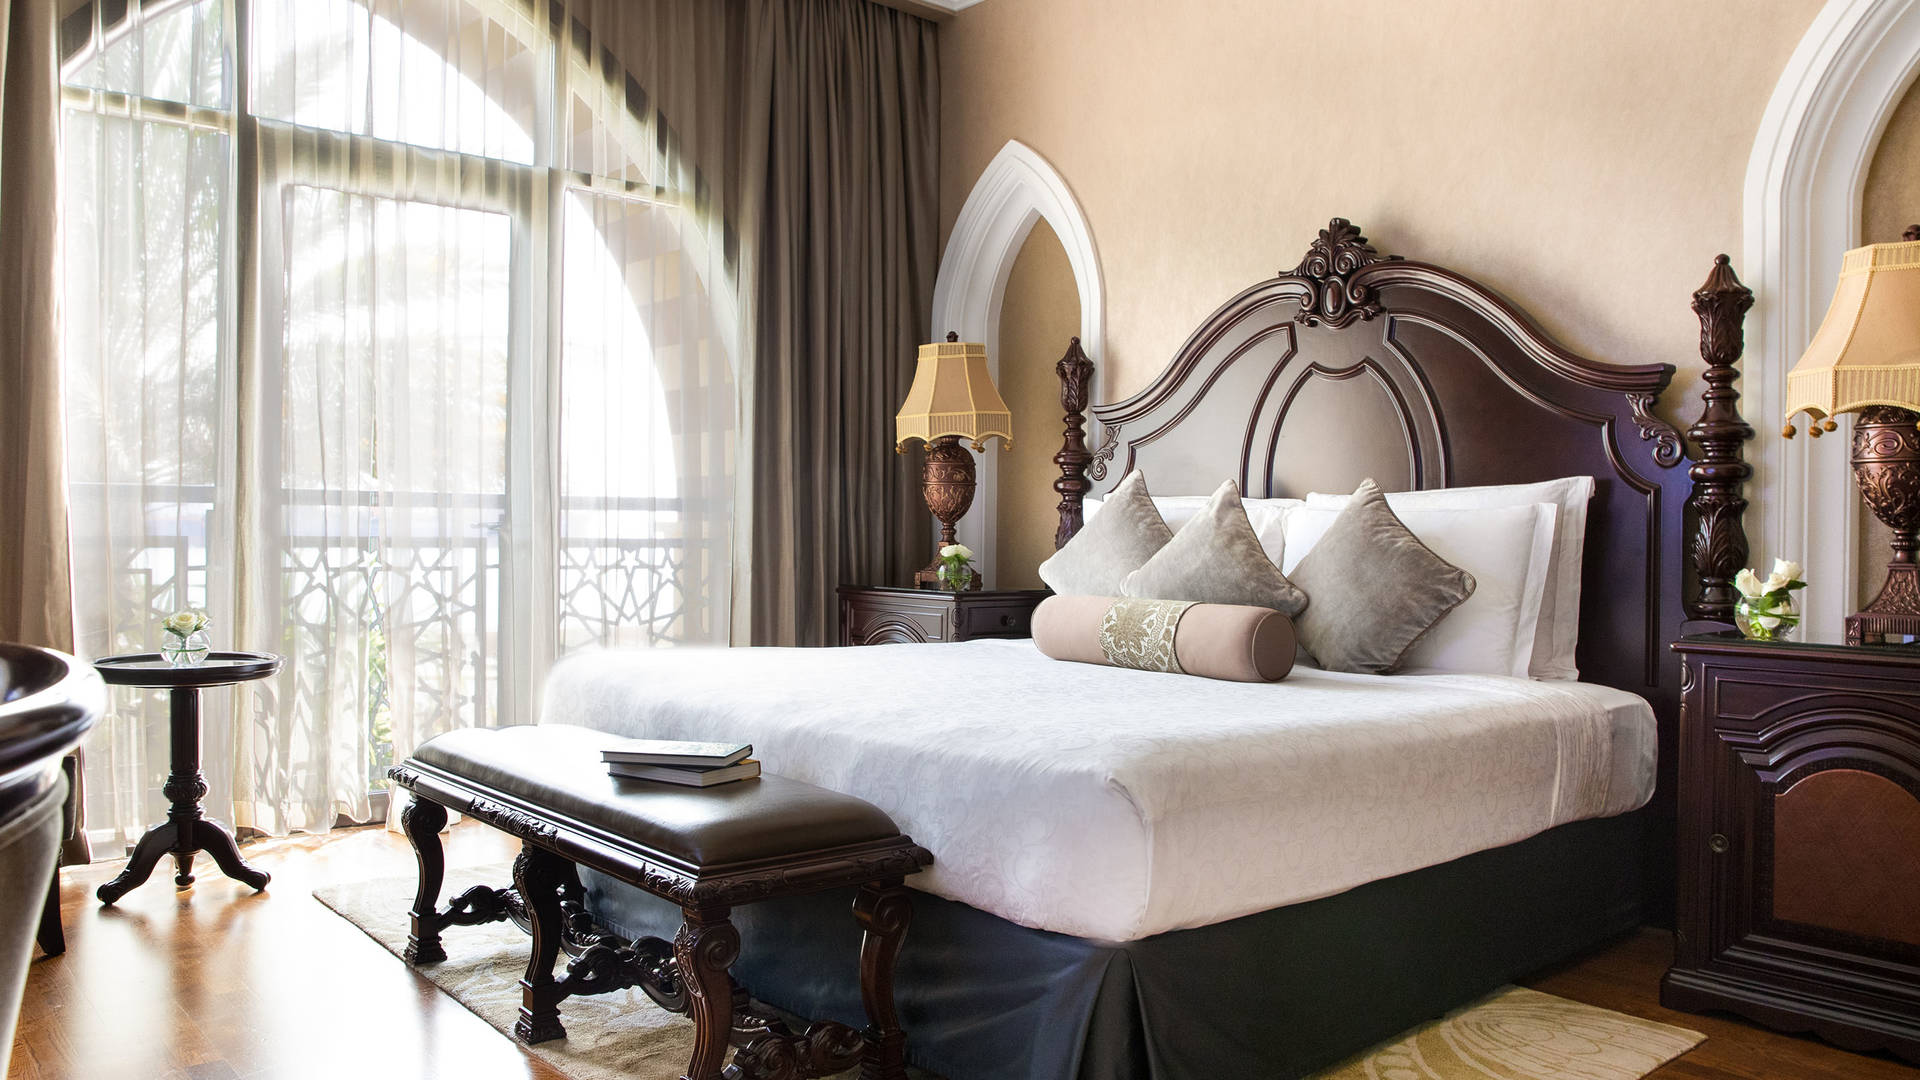 Jumeirah Zabeel Saray Royal Residence Seaview Kingsized bed